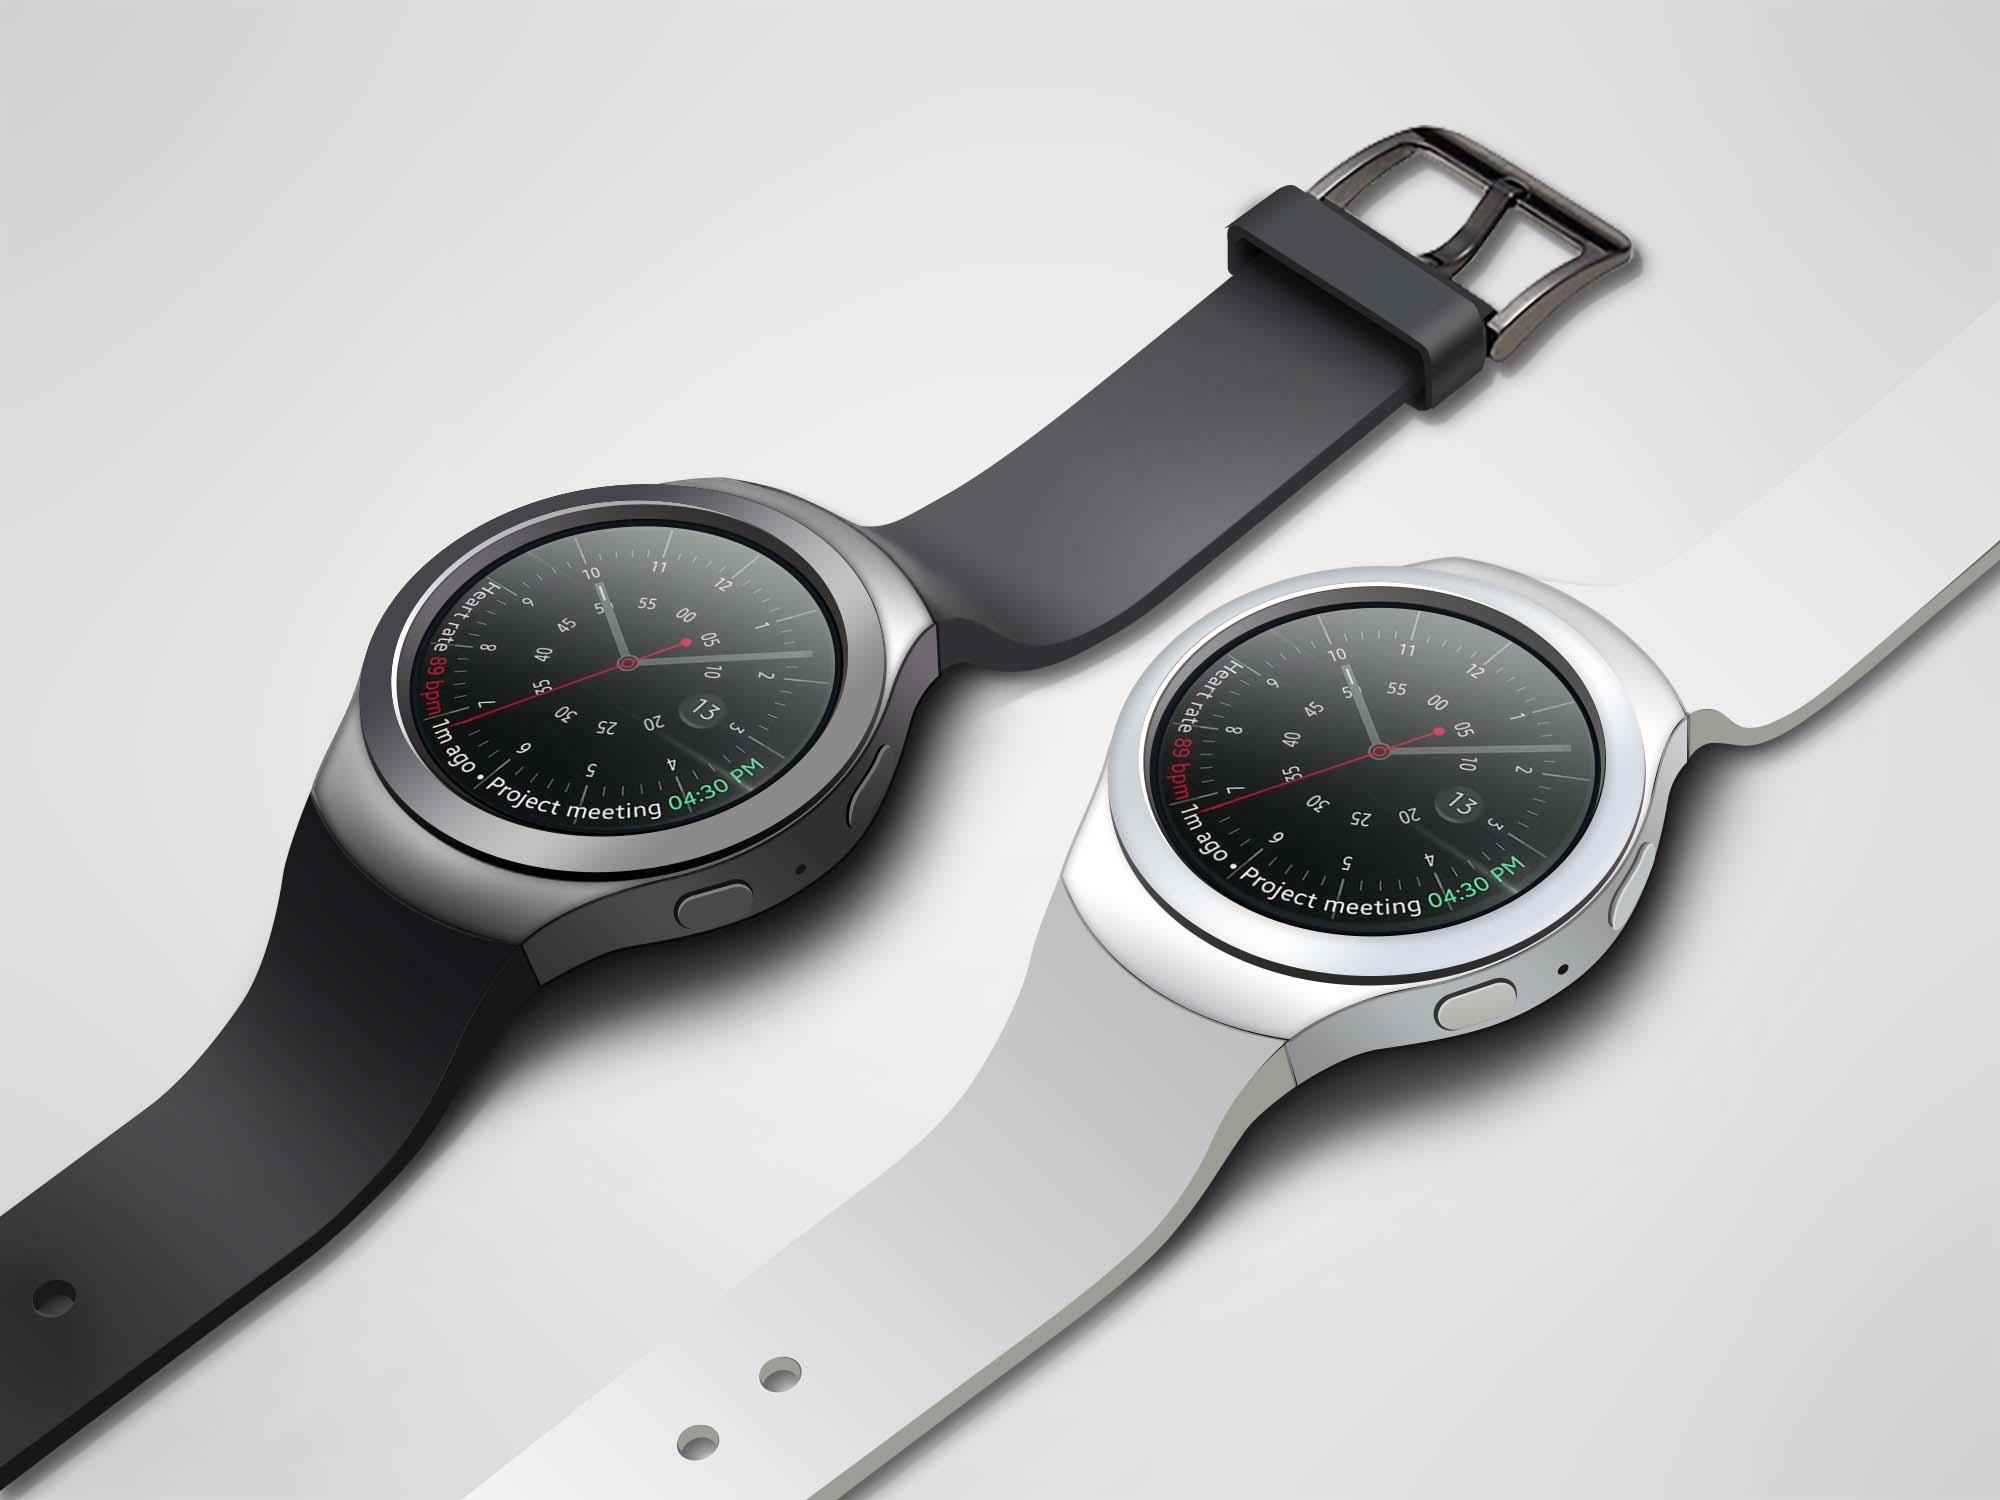 Samsung Gear S2 Watch Mockup